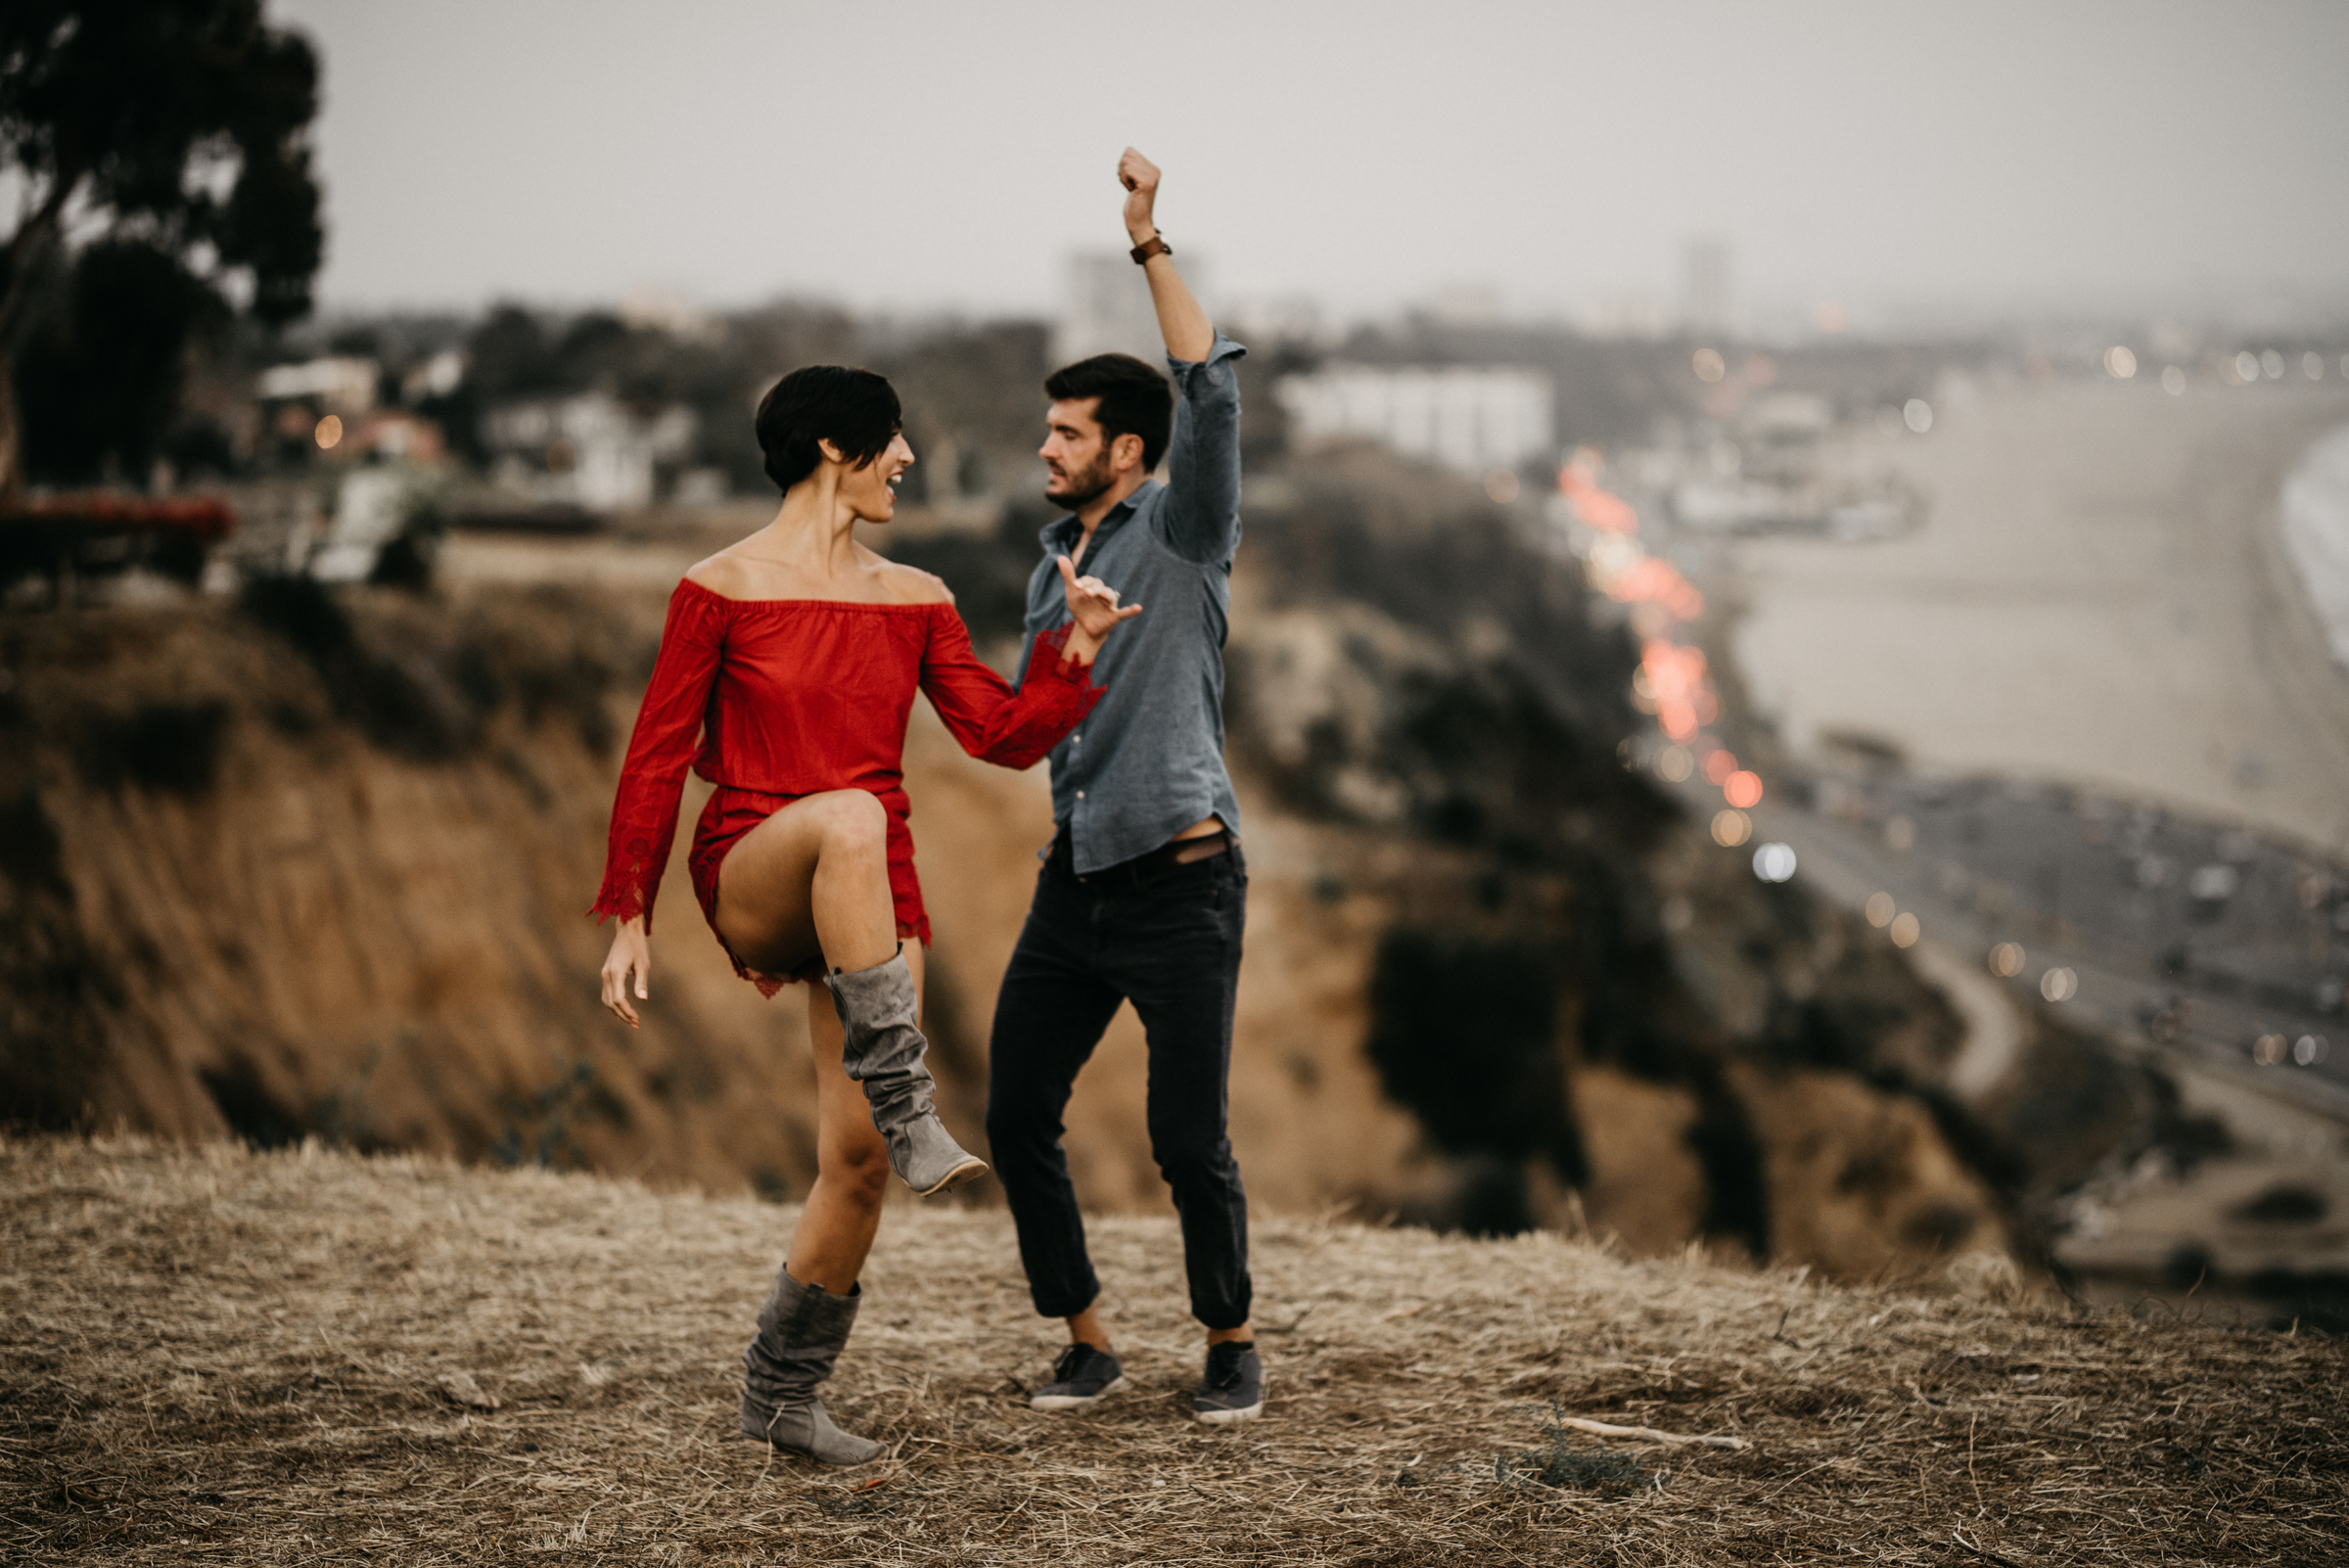 Isaiah + Taylor Photography - Santa Monica Engagement Session, Los Angeles Wedding Photographer-054.jpg